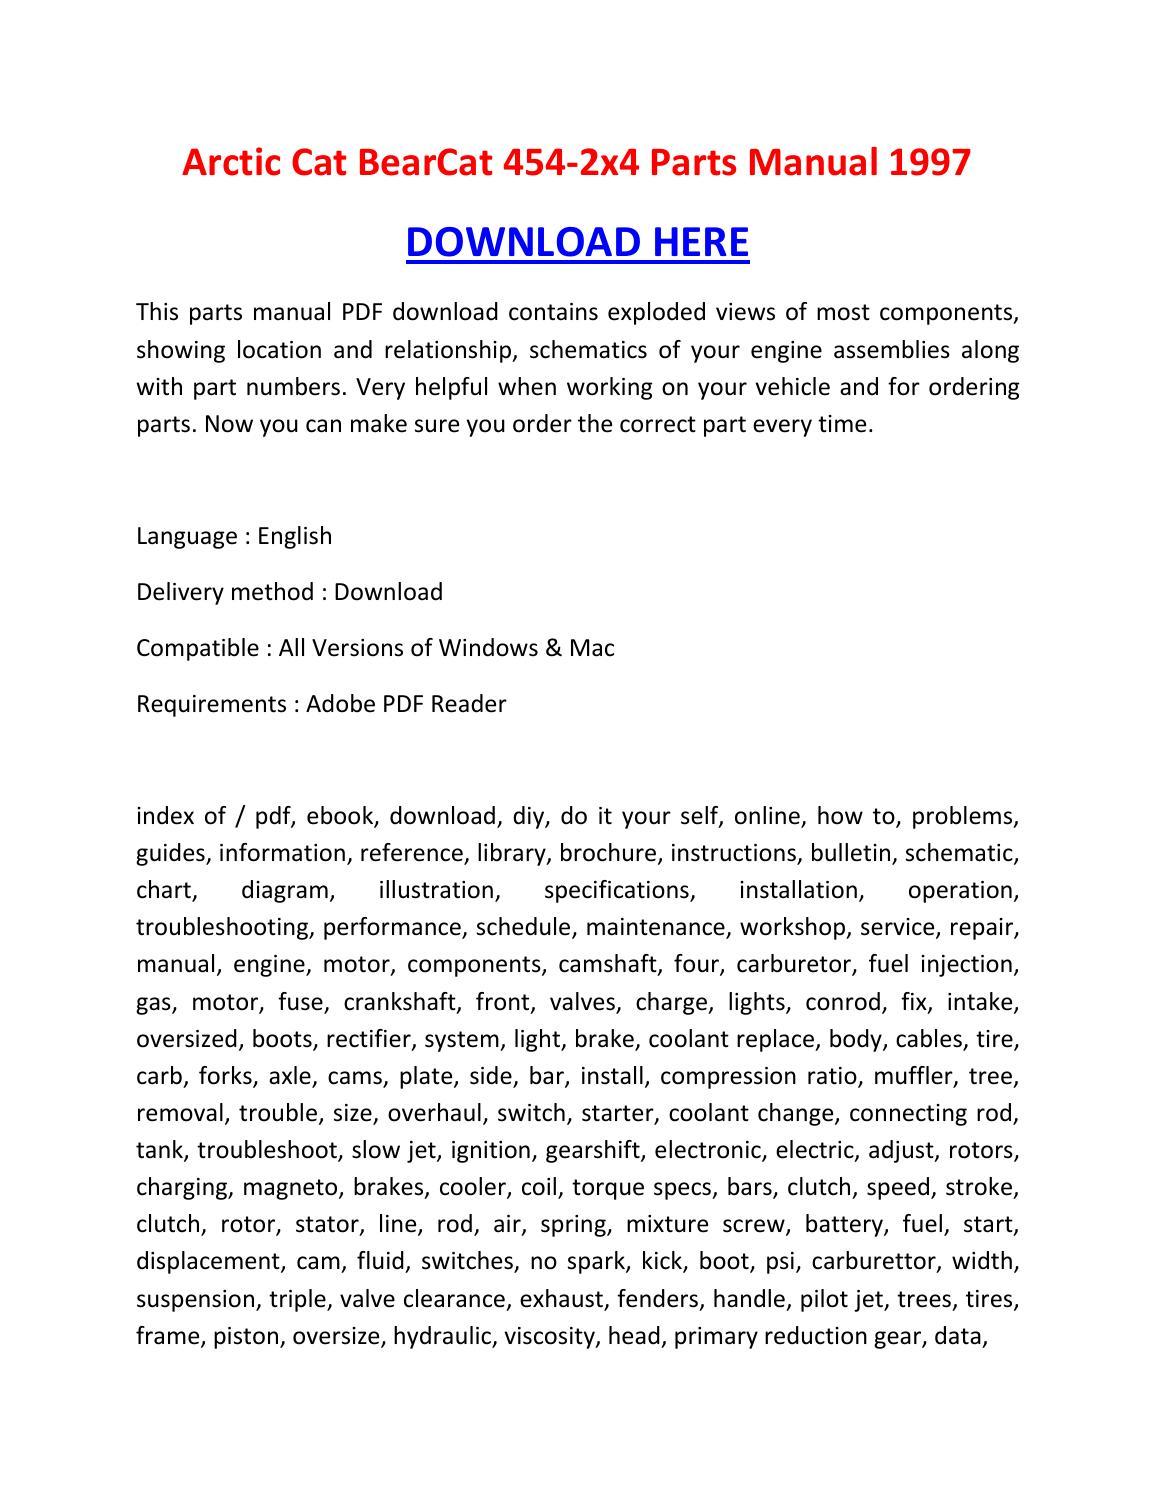 Arctic cat bearcat 454 2x4 parts manual 1997 by ...